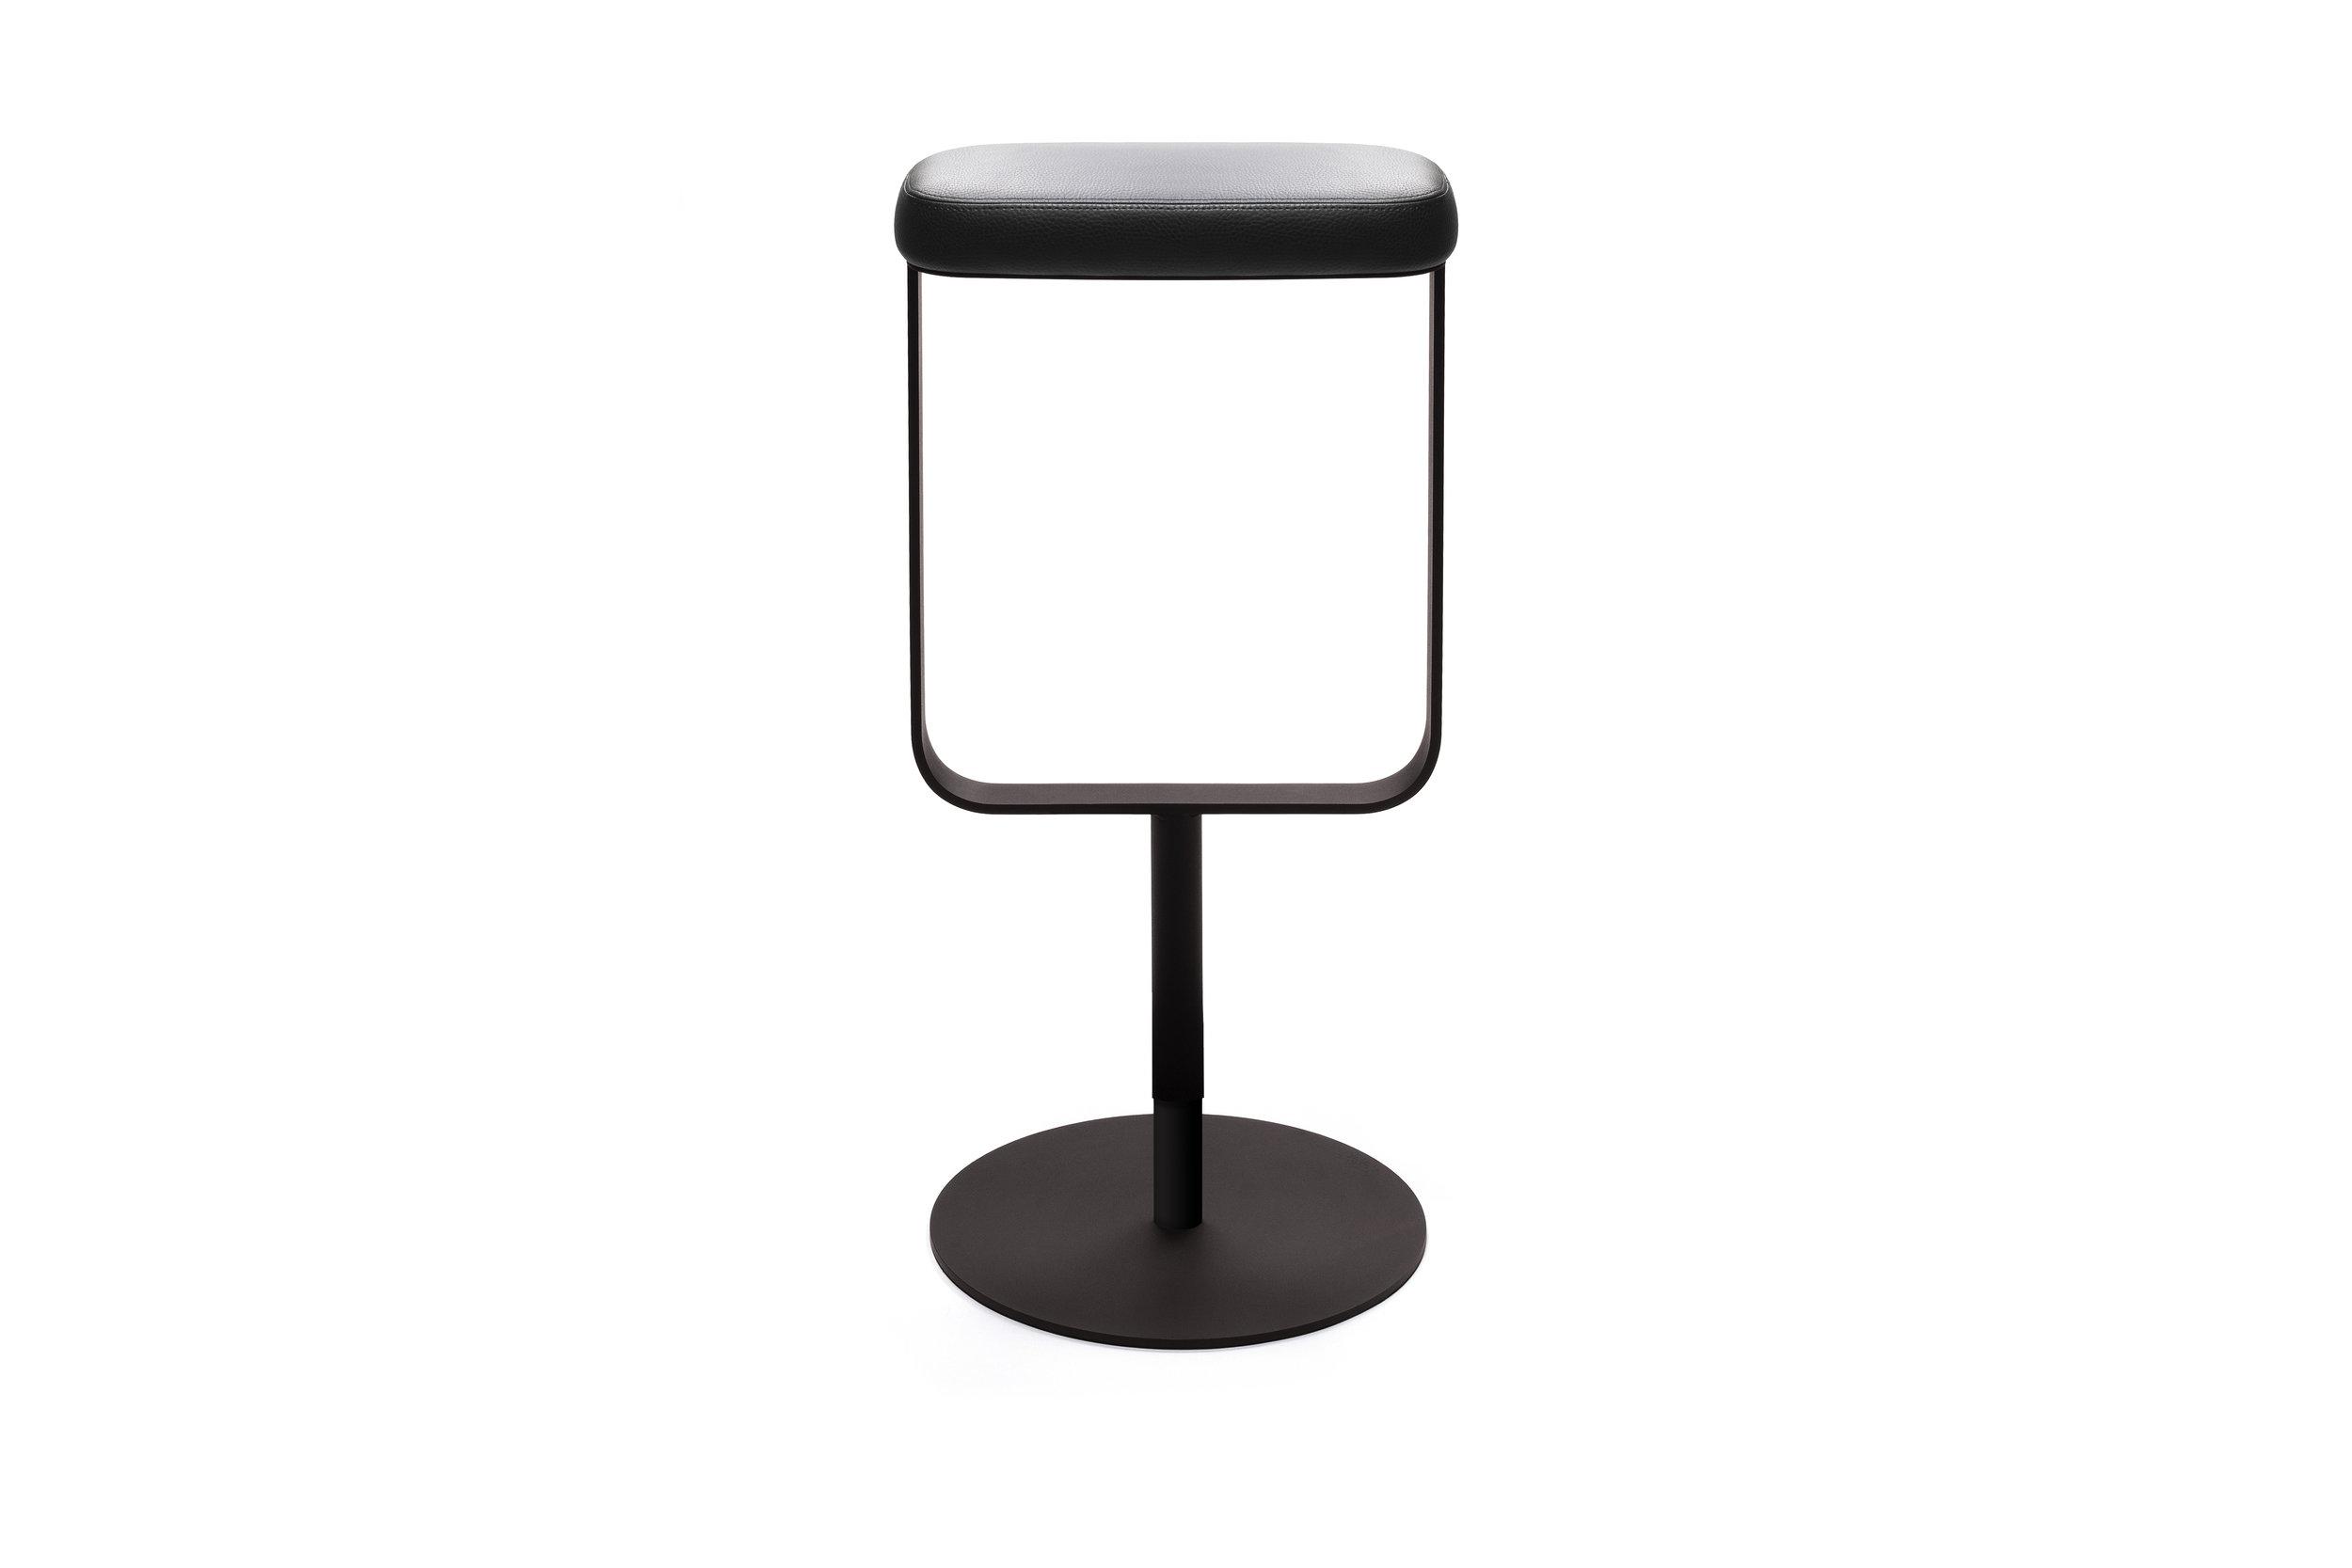 OBJEKTEN_Slim_Bar stool_AlainBerteau_6.jpg